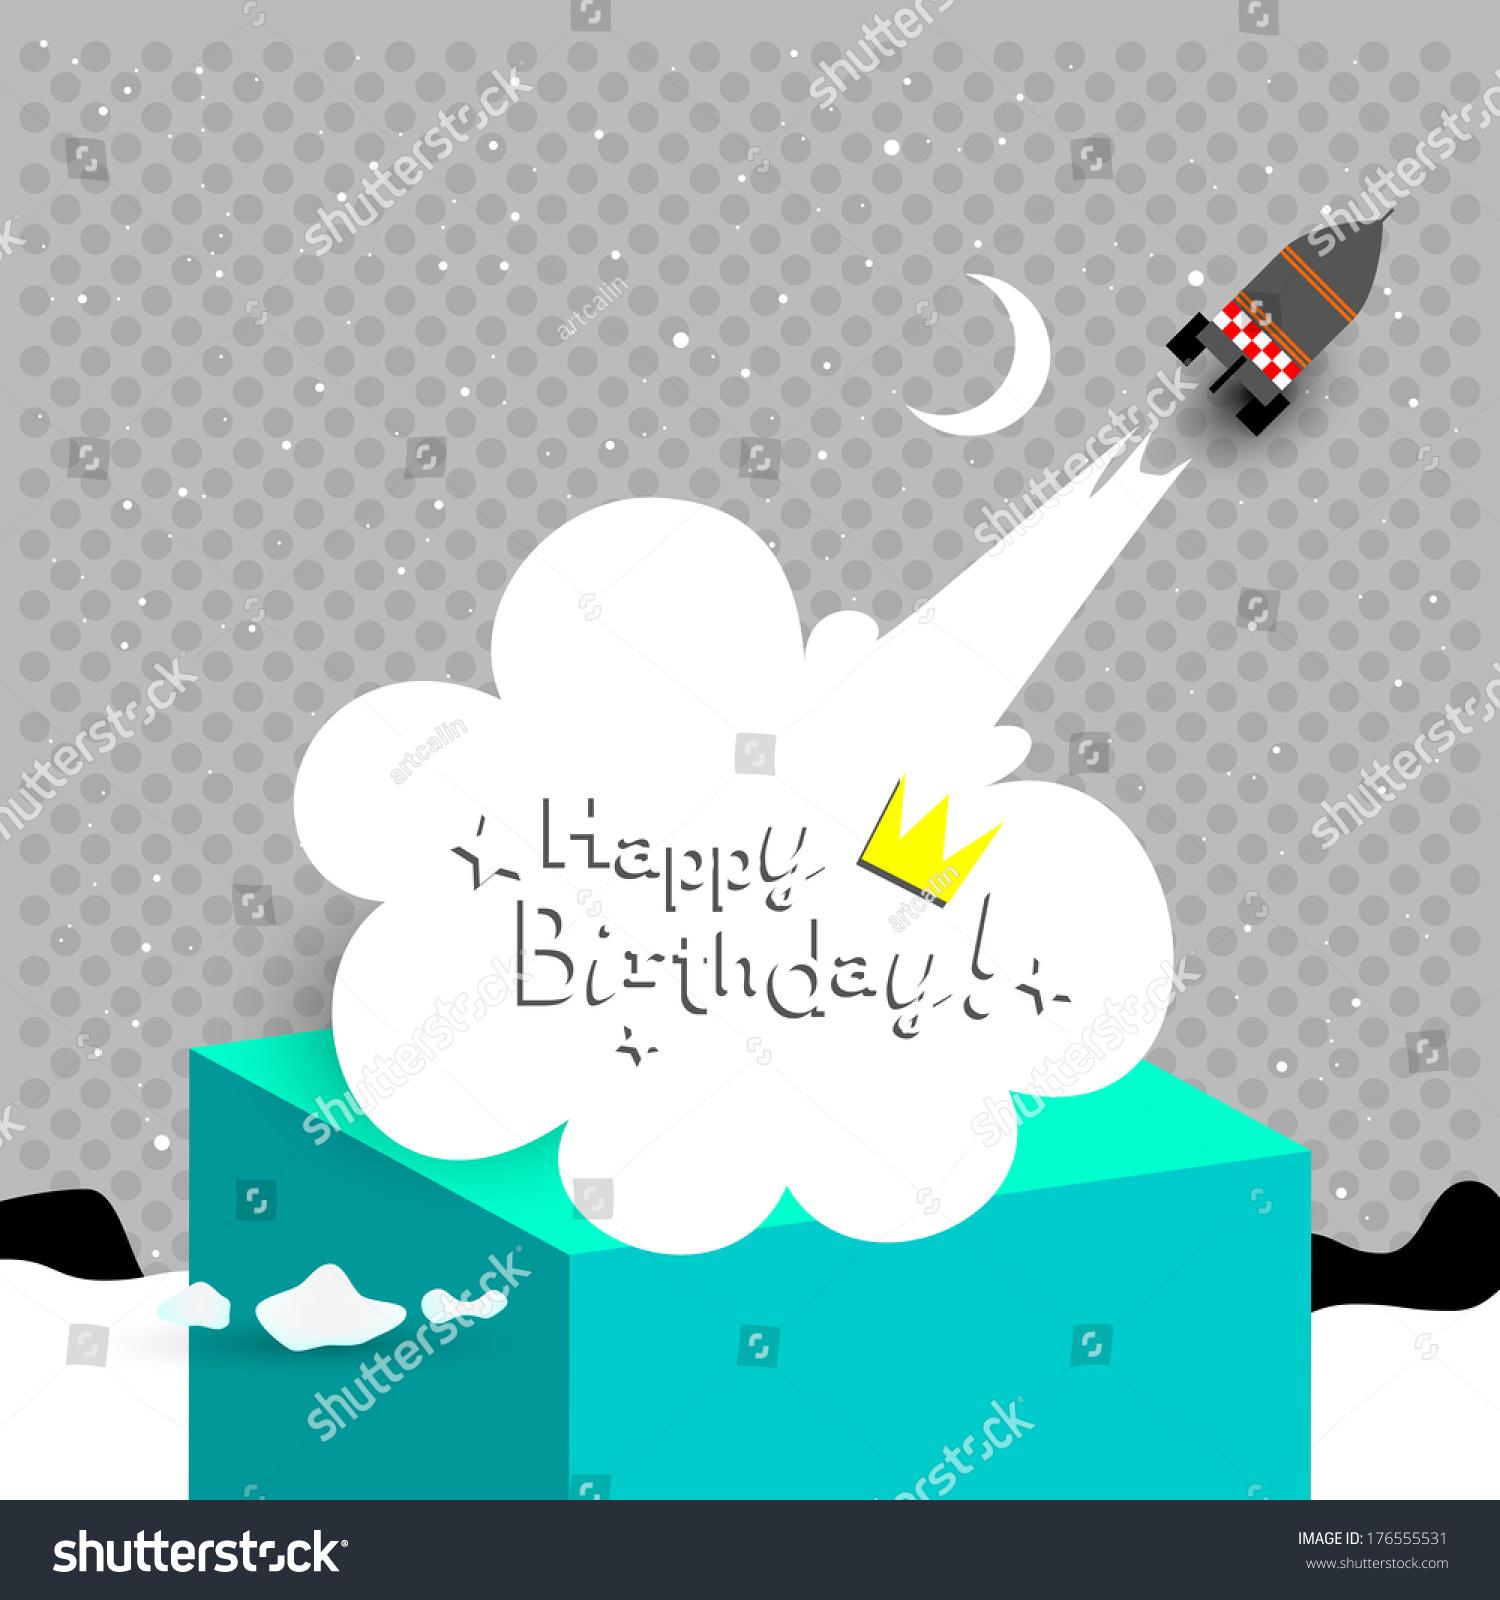 Happy Birthday Card Children Anniversary Vector Illustration With Rocket